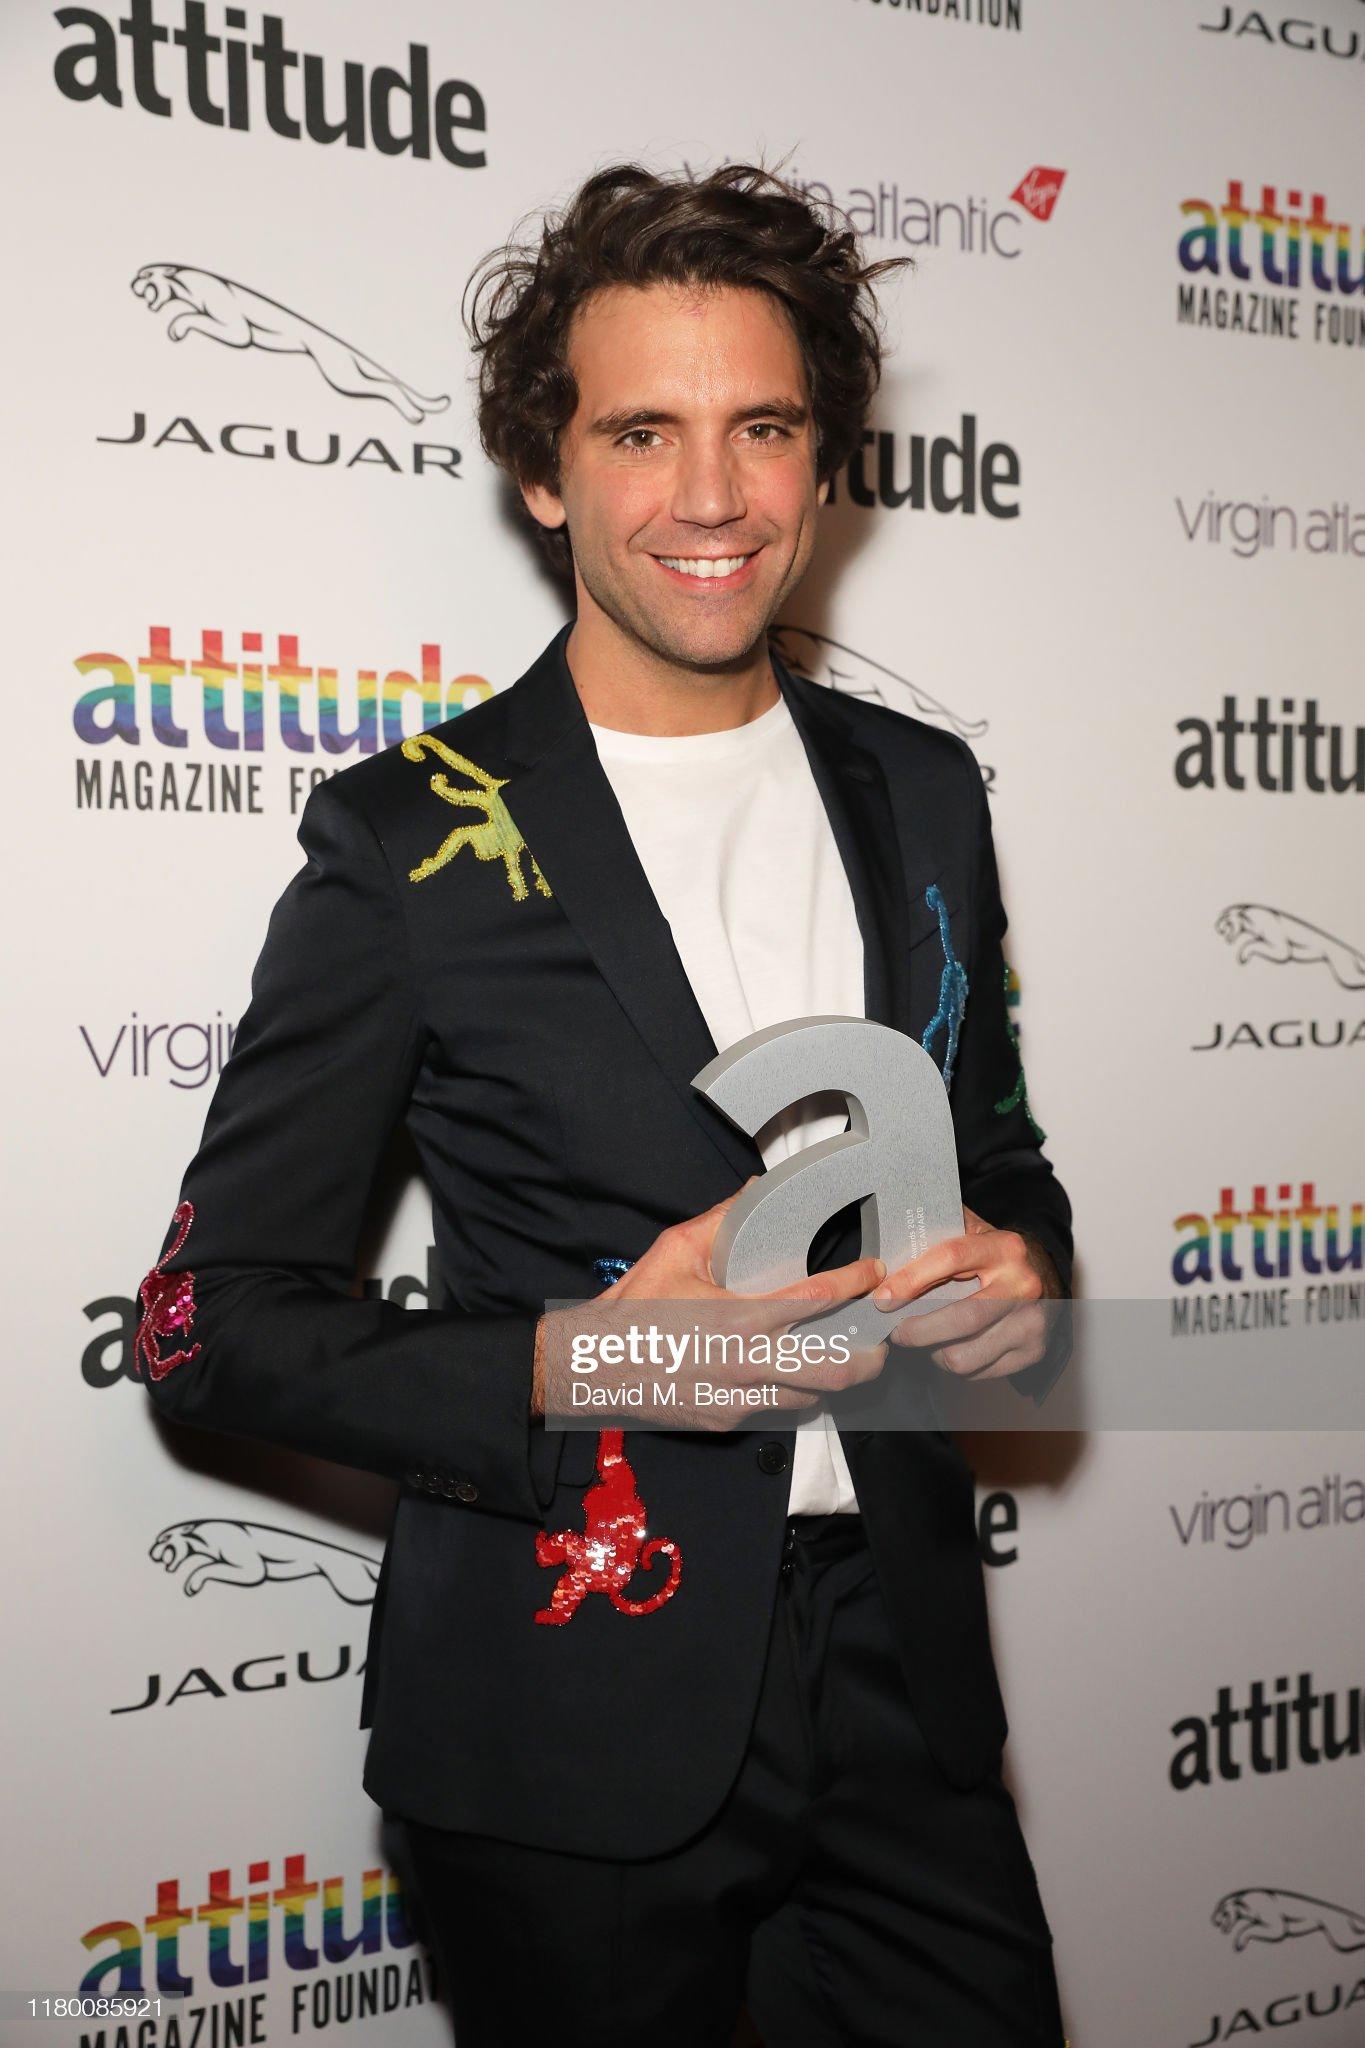 mika-winner-of-the-attitude-music-award-